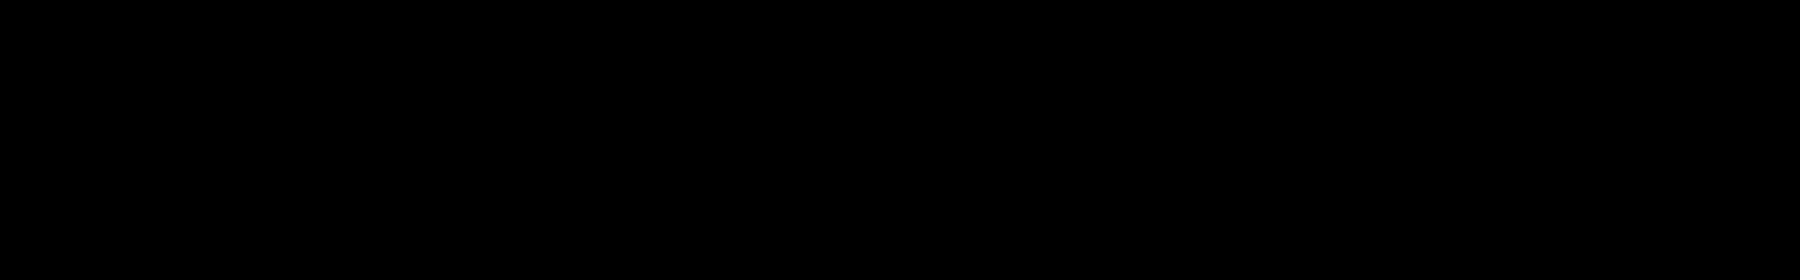 ONE STEP audio waveform